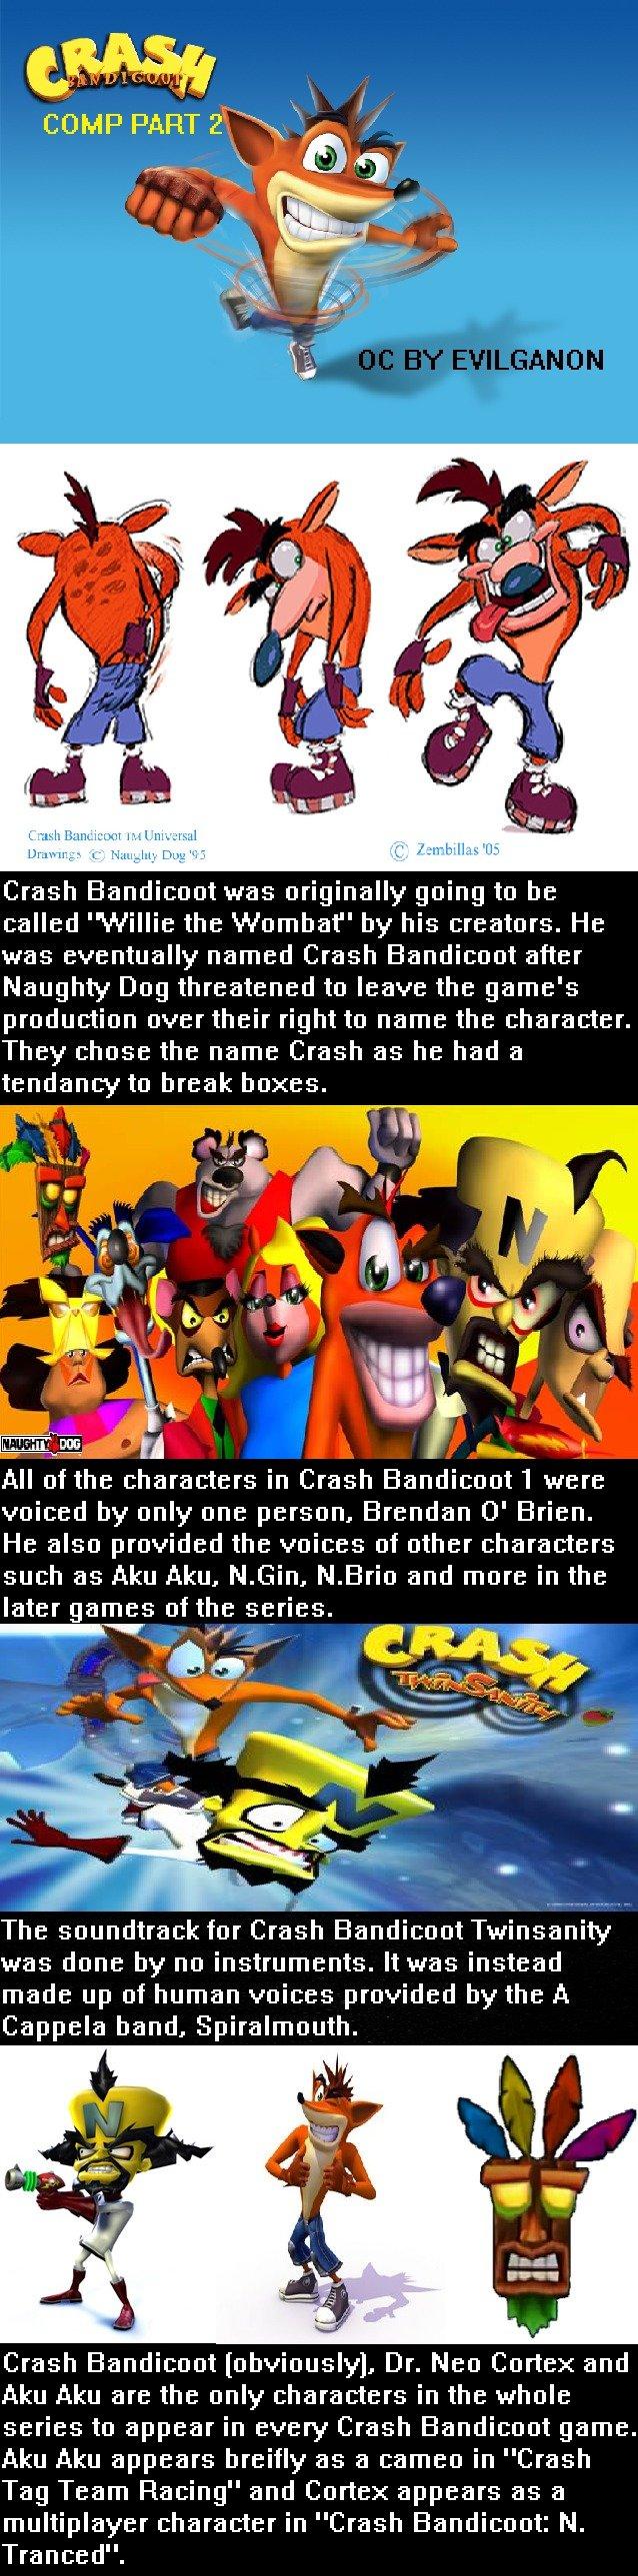 Crash Bandicoot Comp Part 2. 100% OC.. Crash Bandicoot was originally, going to be called 'Willie the his creators. He was eventually' named Crash Bandicoot aft